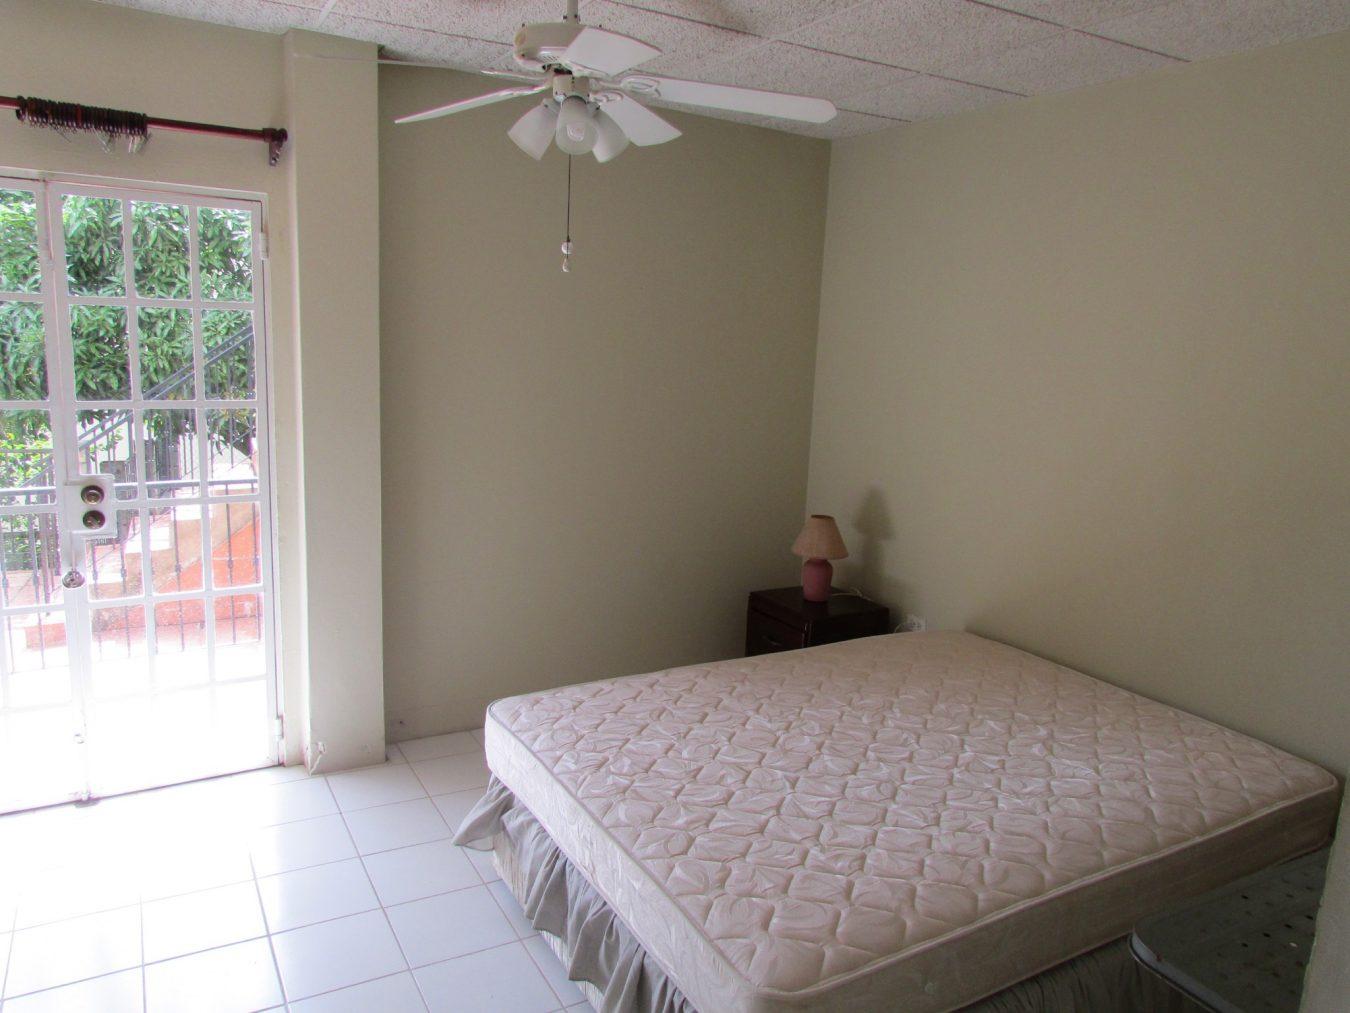 Spanish vilas apartment, trinidad and tobago luxury real estate